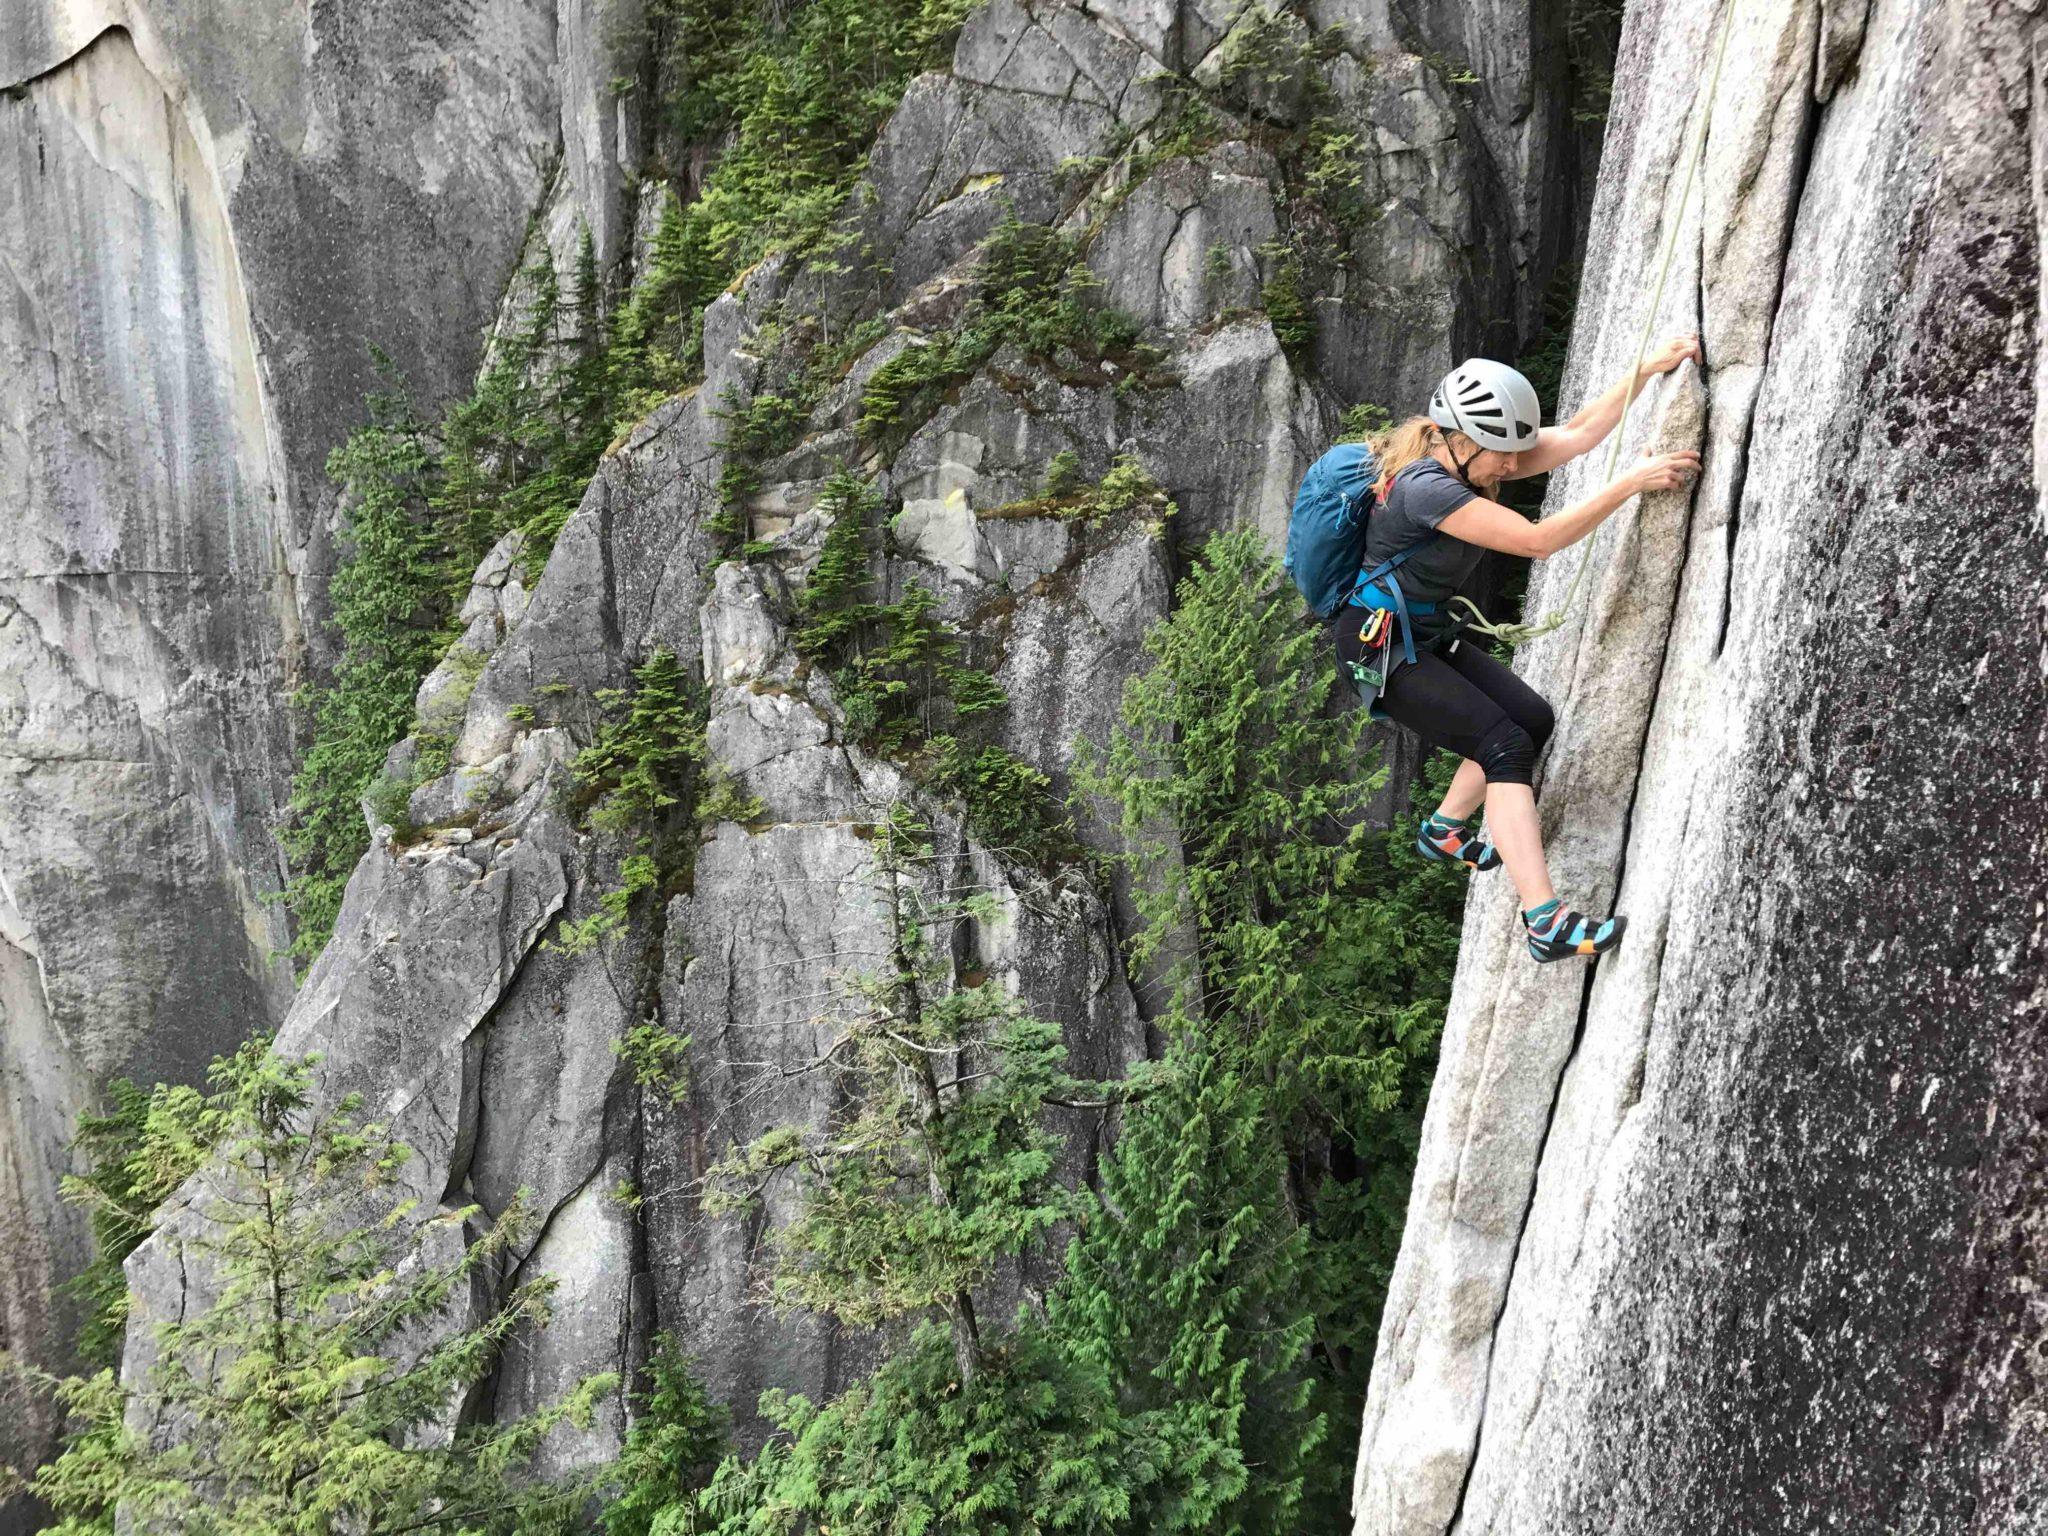 Squamish rock climbing experience